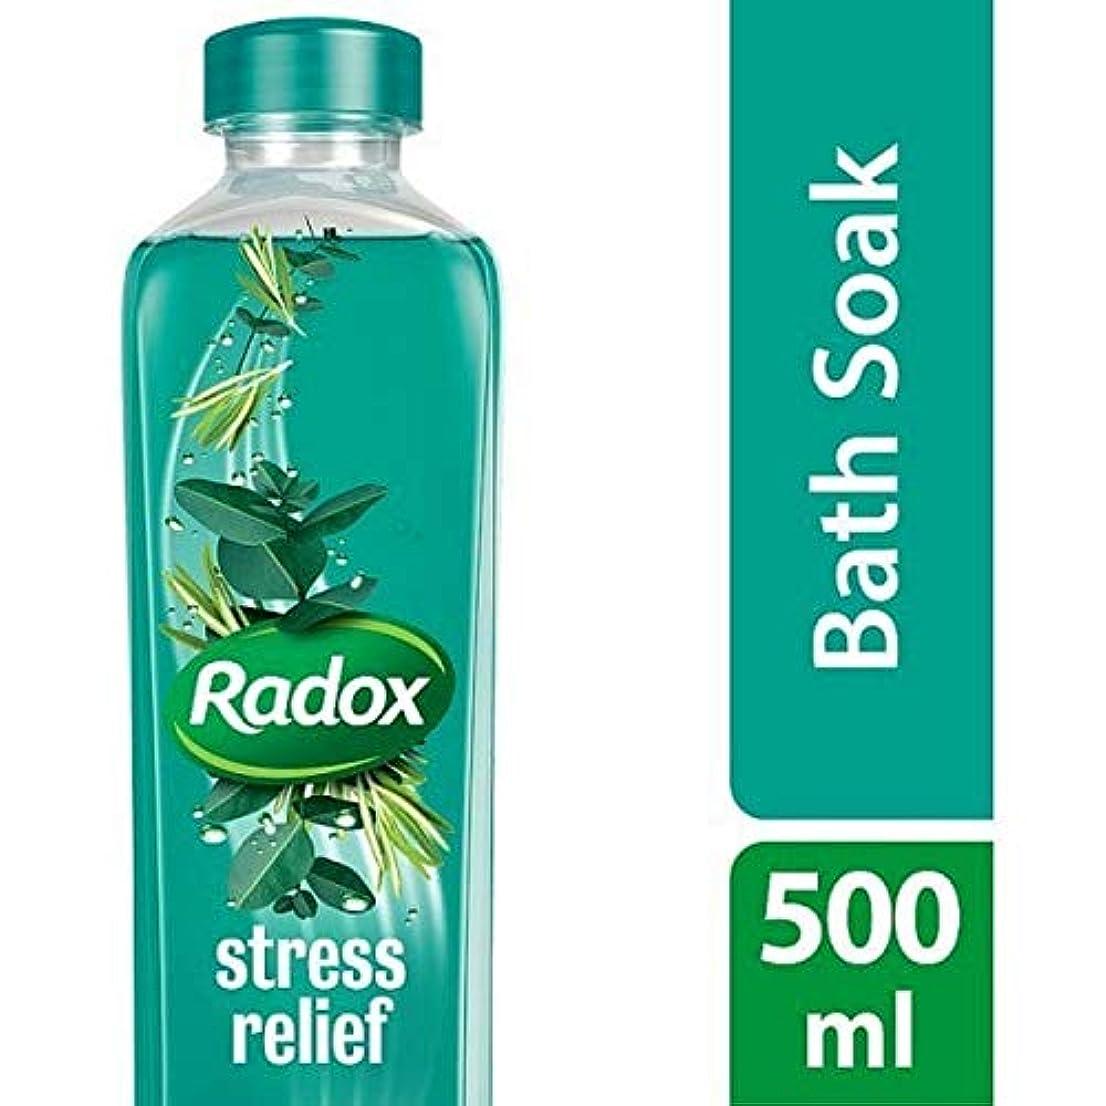 [Radox] Radoxは、500ミリリットルのソーク良い香りストレスリリーフ風呂を感じます - Radox Feel Good Fragrance Stress Relief Bath Soak 500ml [並行輸入品]